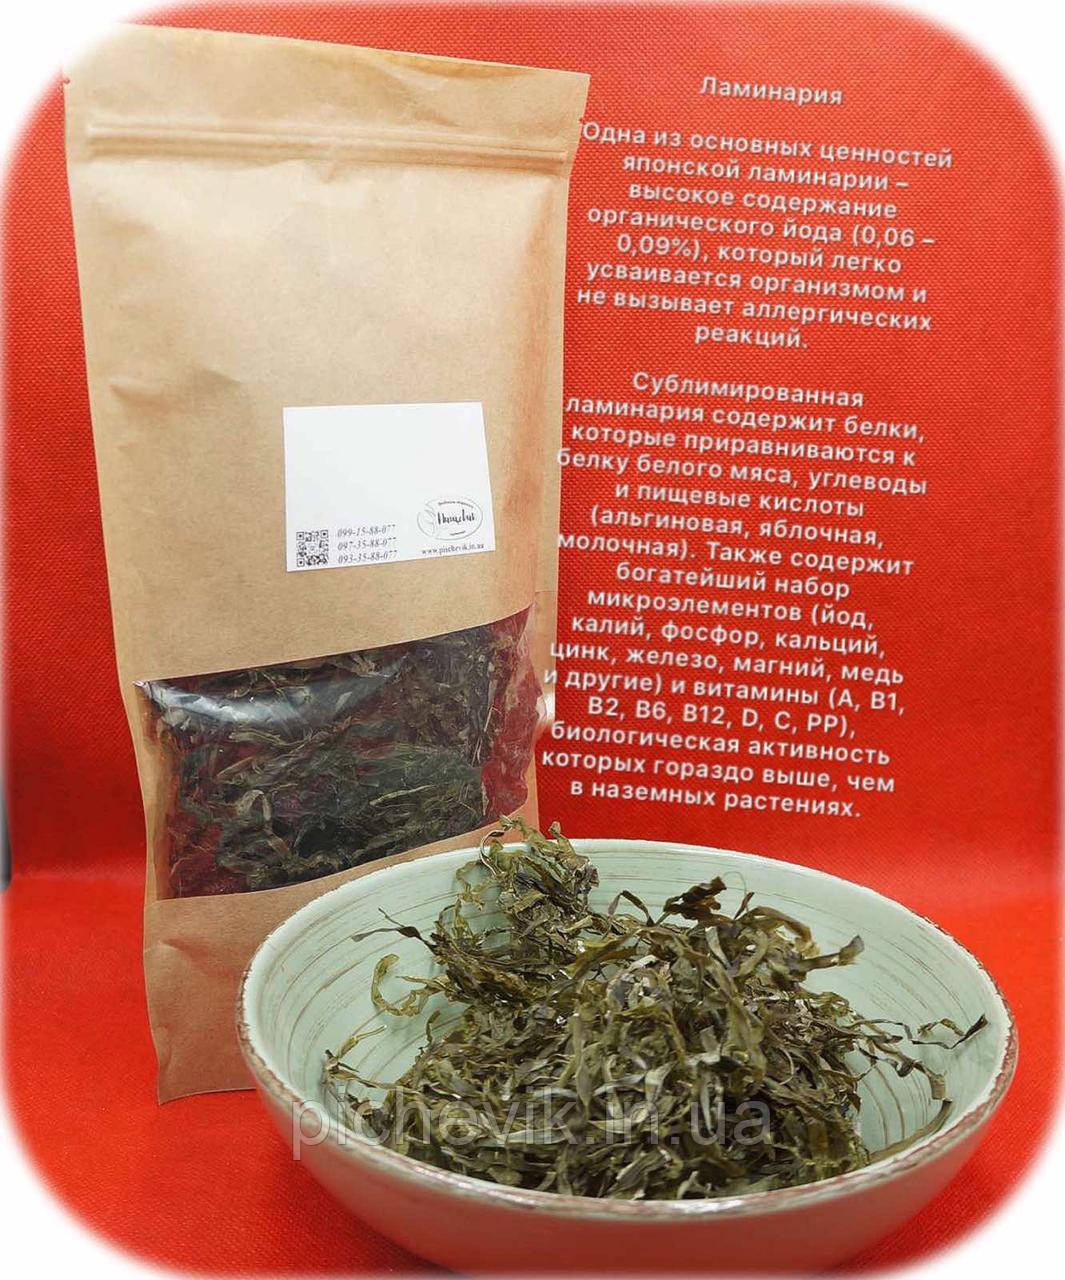 Морська капуста Ламінарія сублімована (Китай) Вага: 1 кг